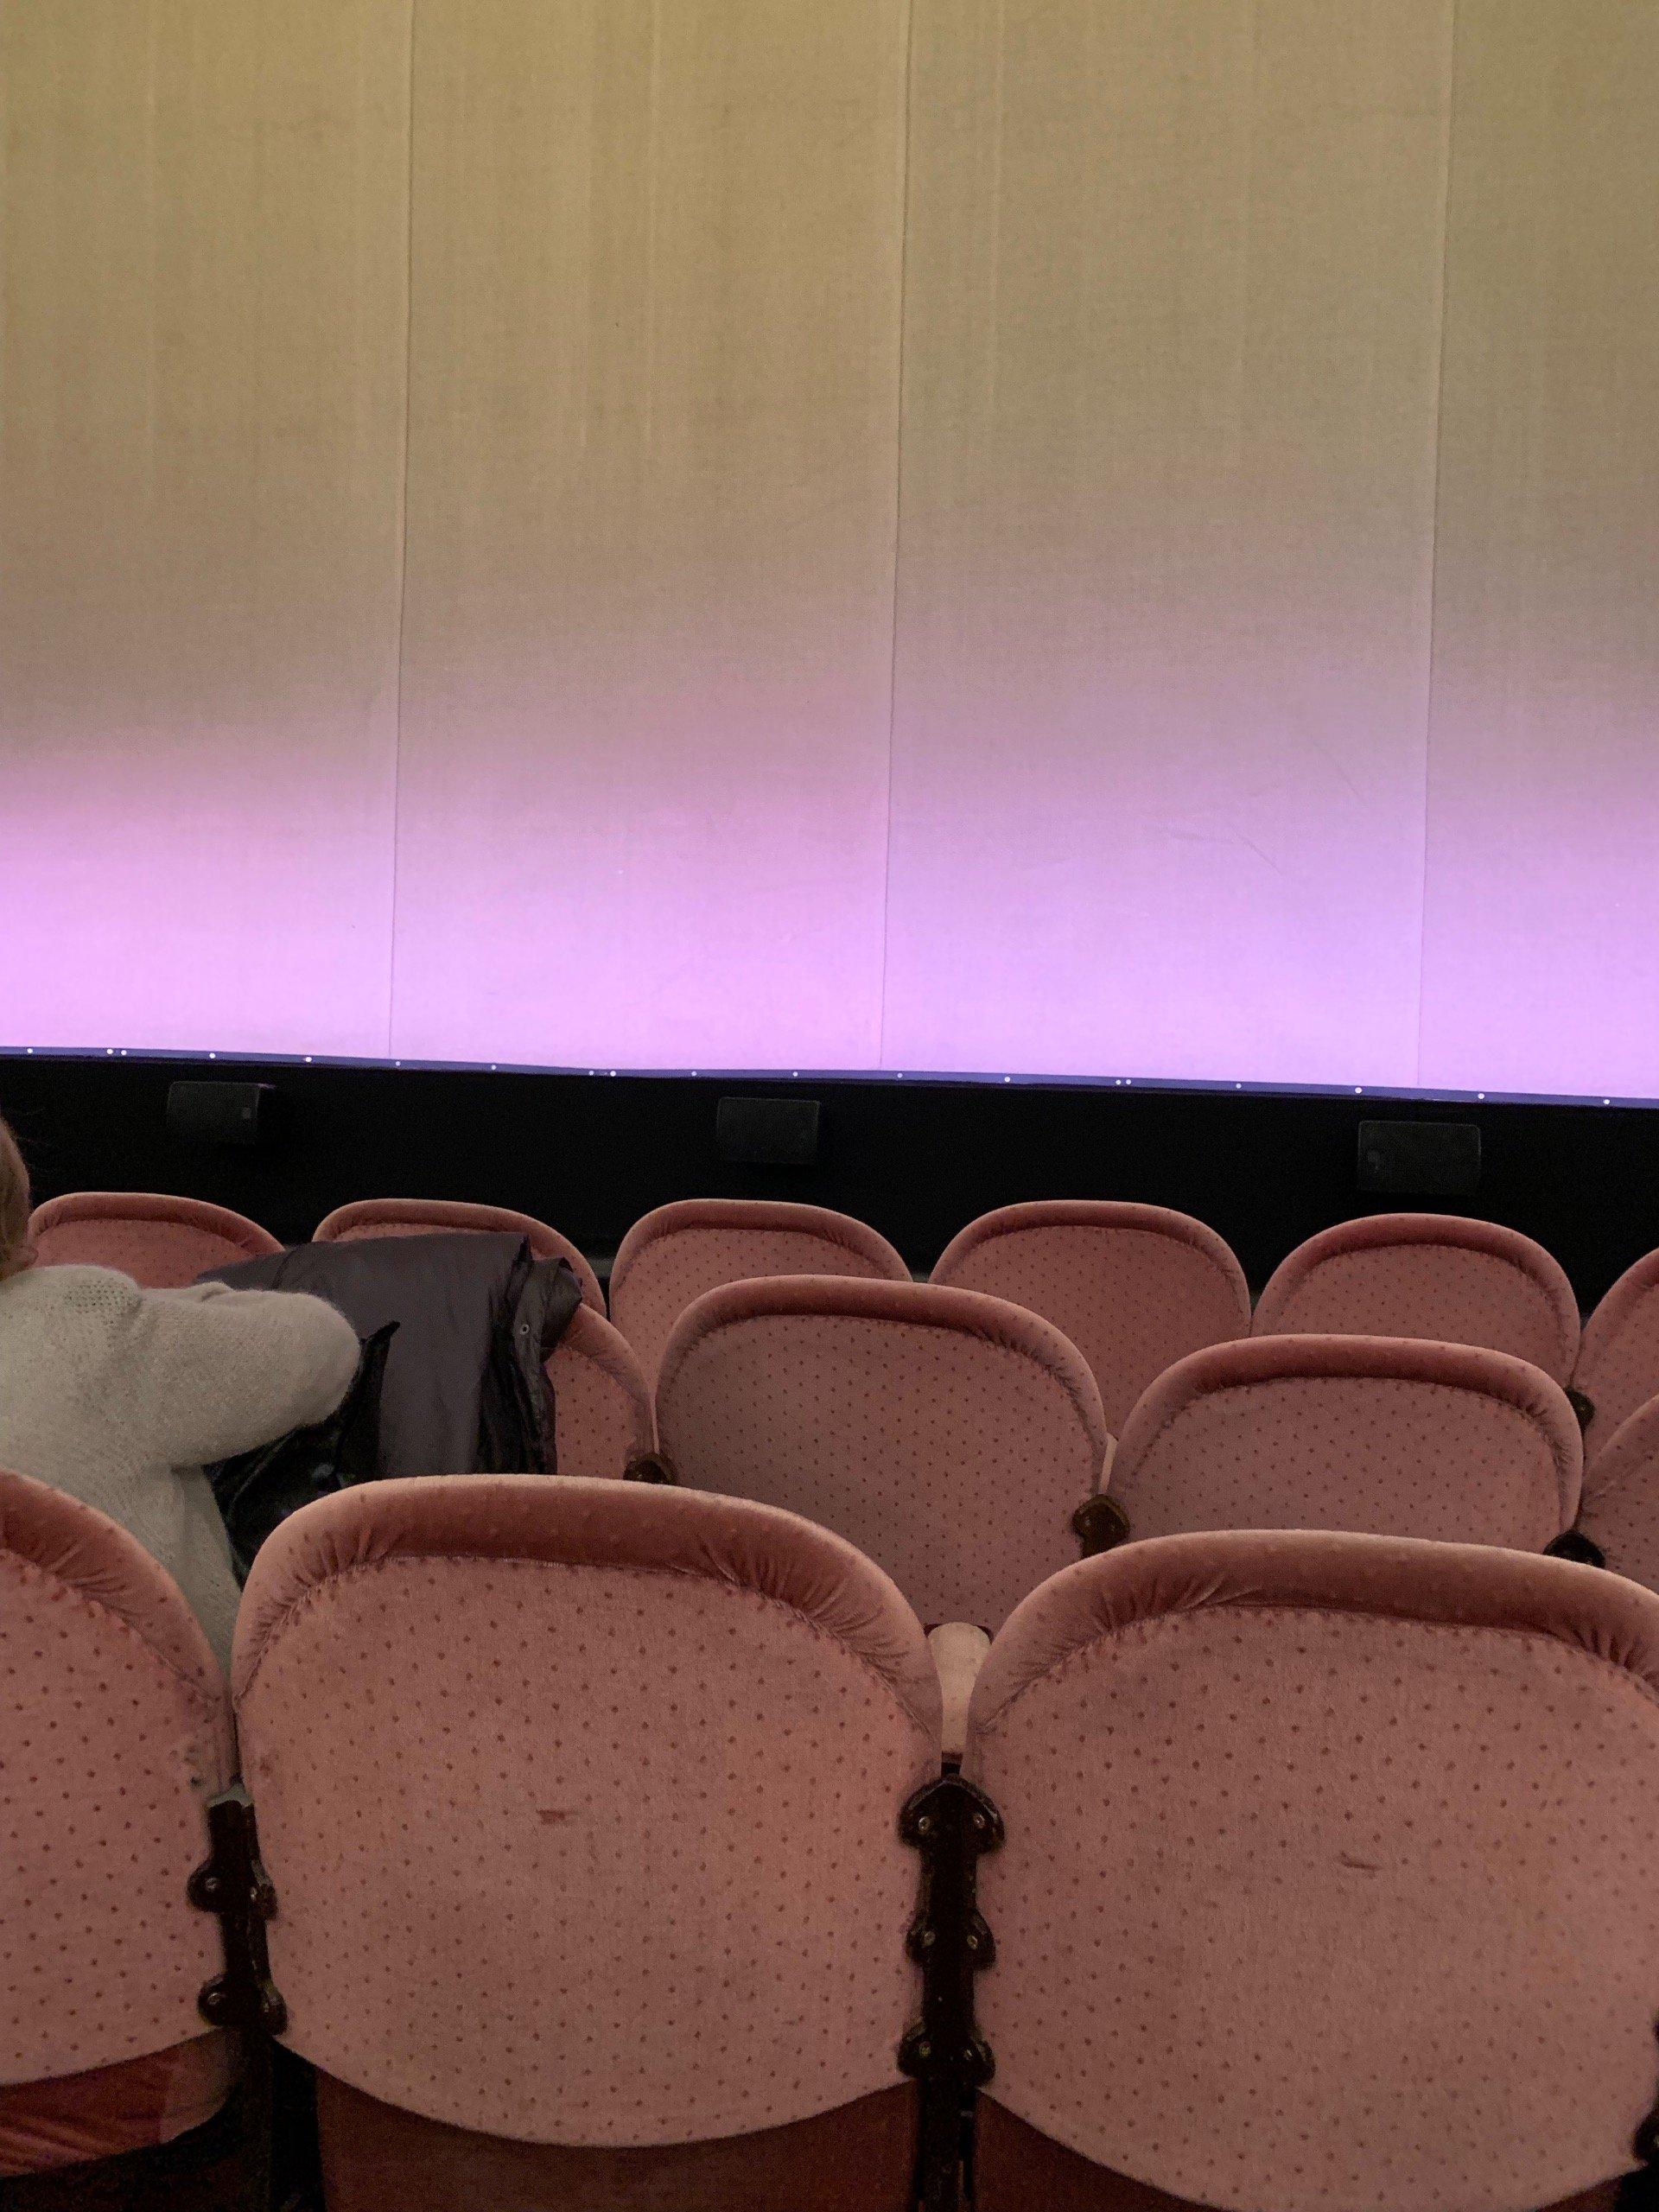 Noël Coward Theatre Section Stalls Row E Seat 12